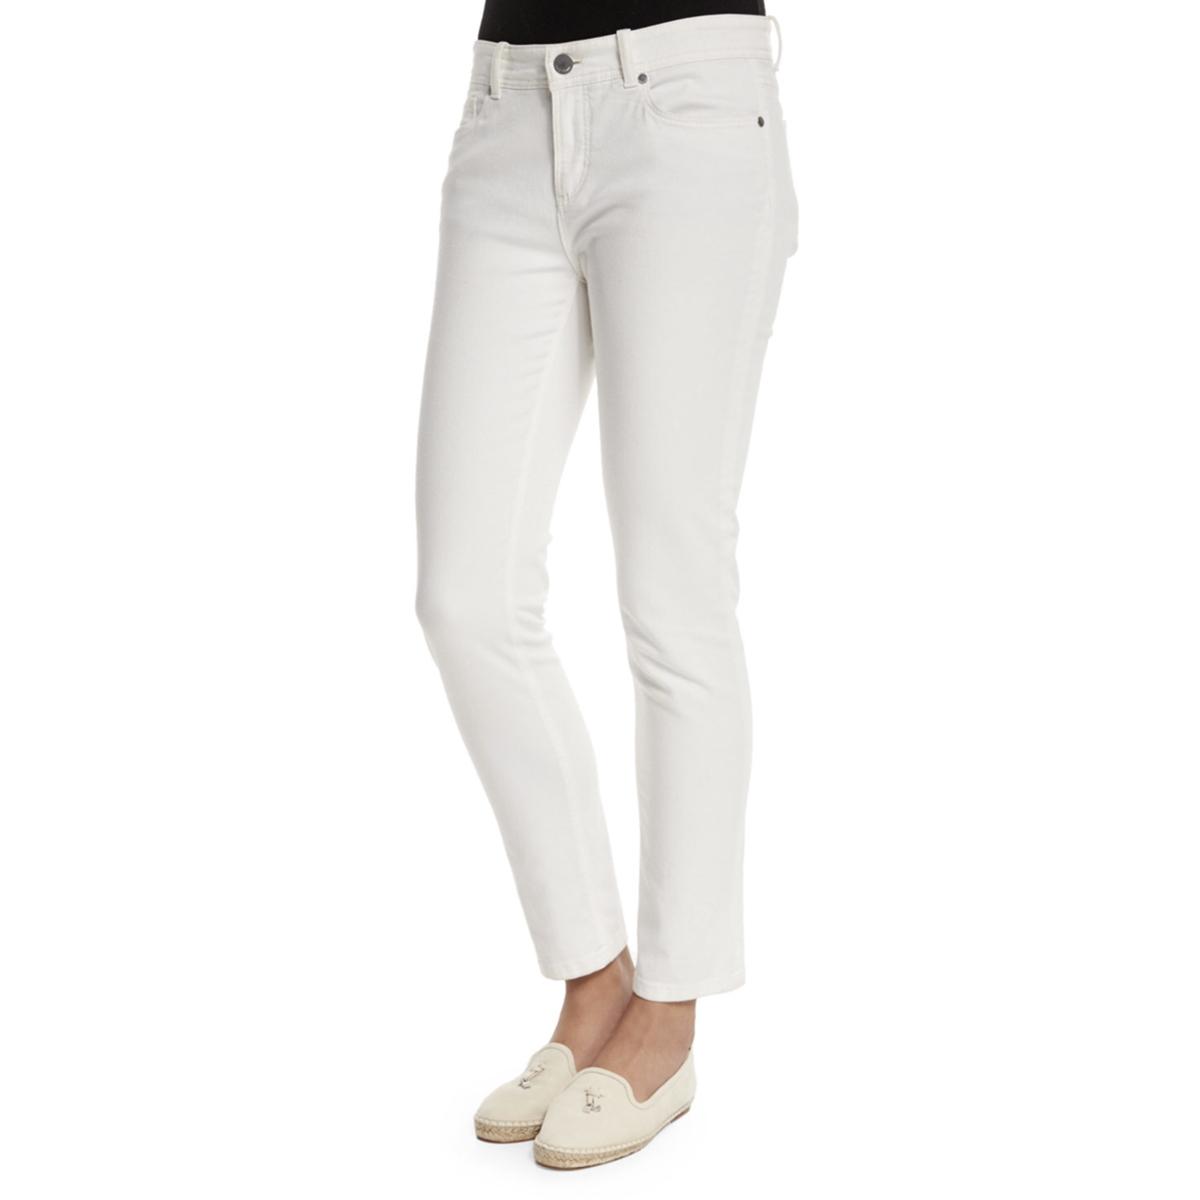 white loro piana jeans nm.jpg